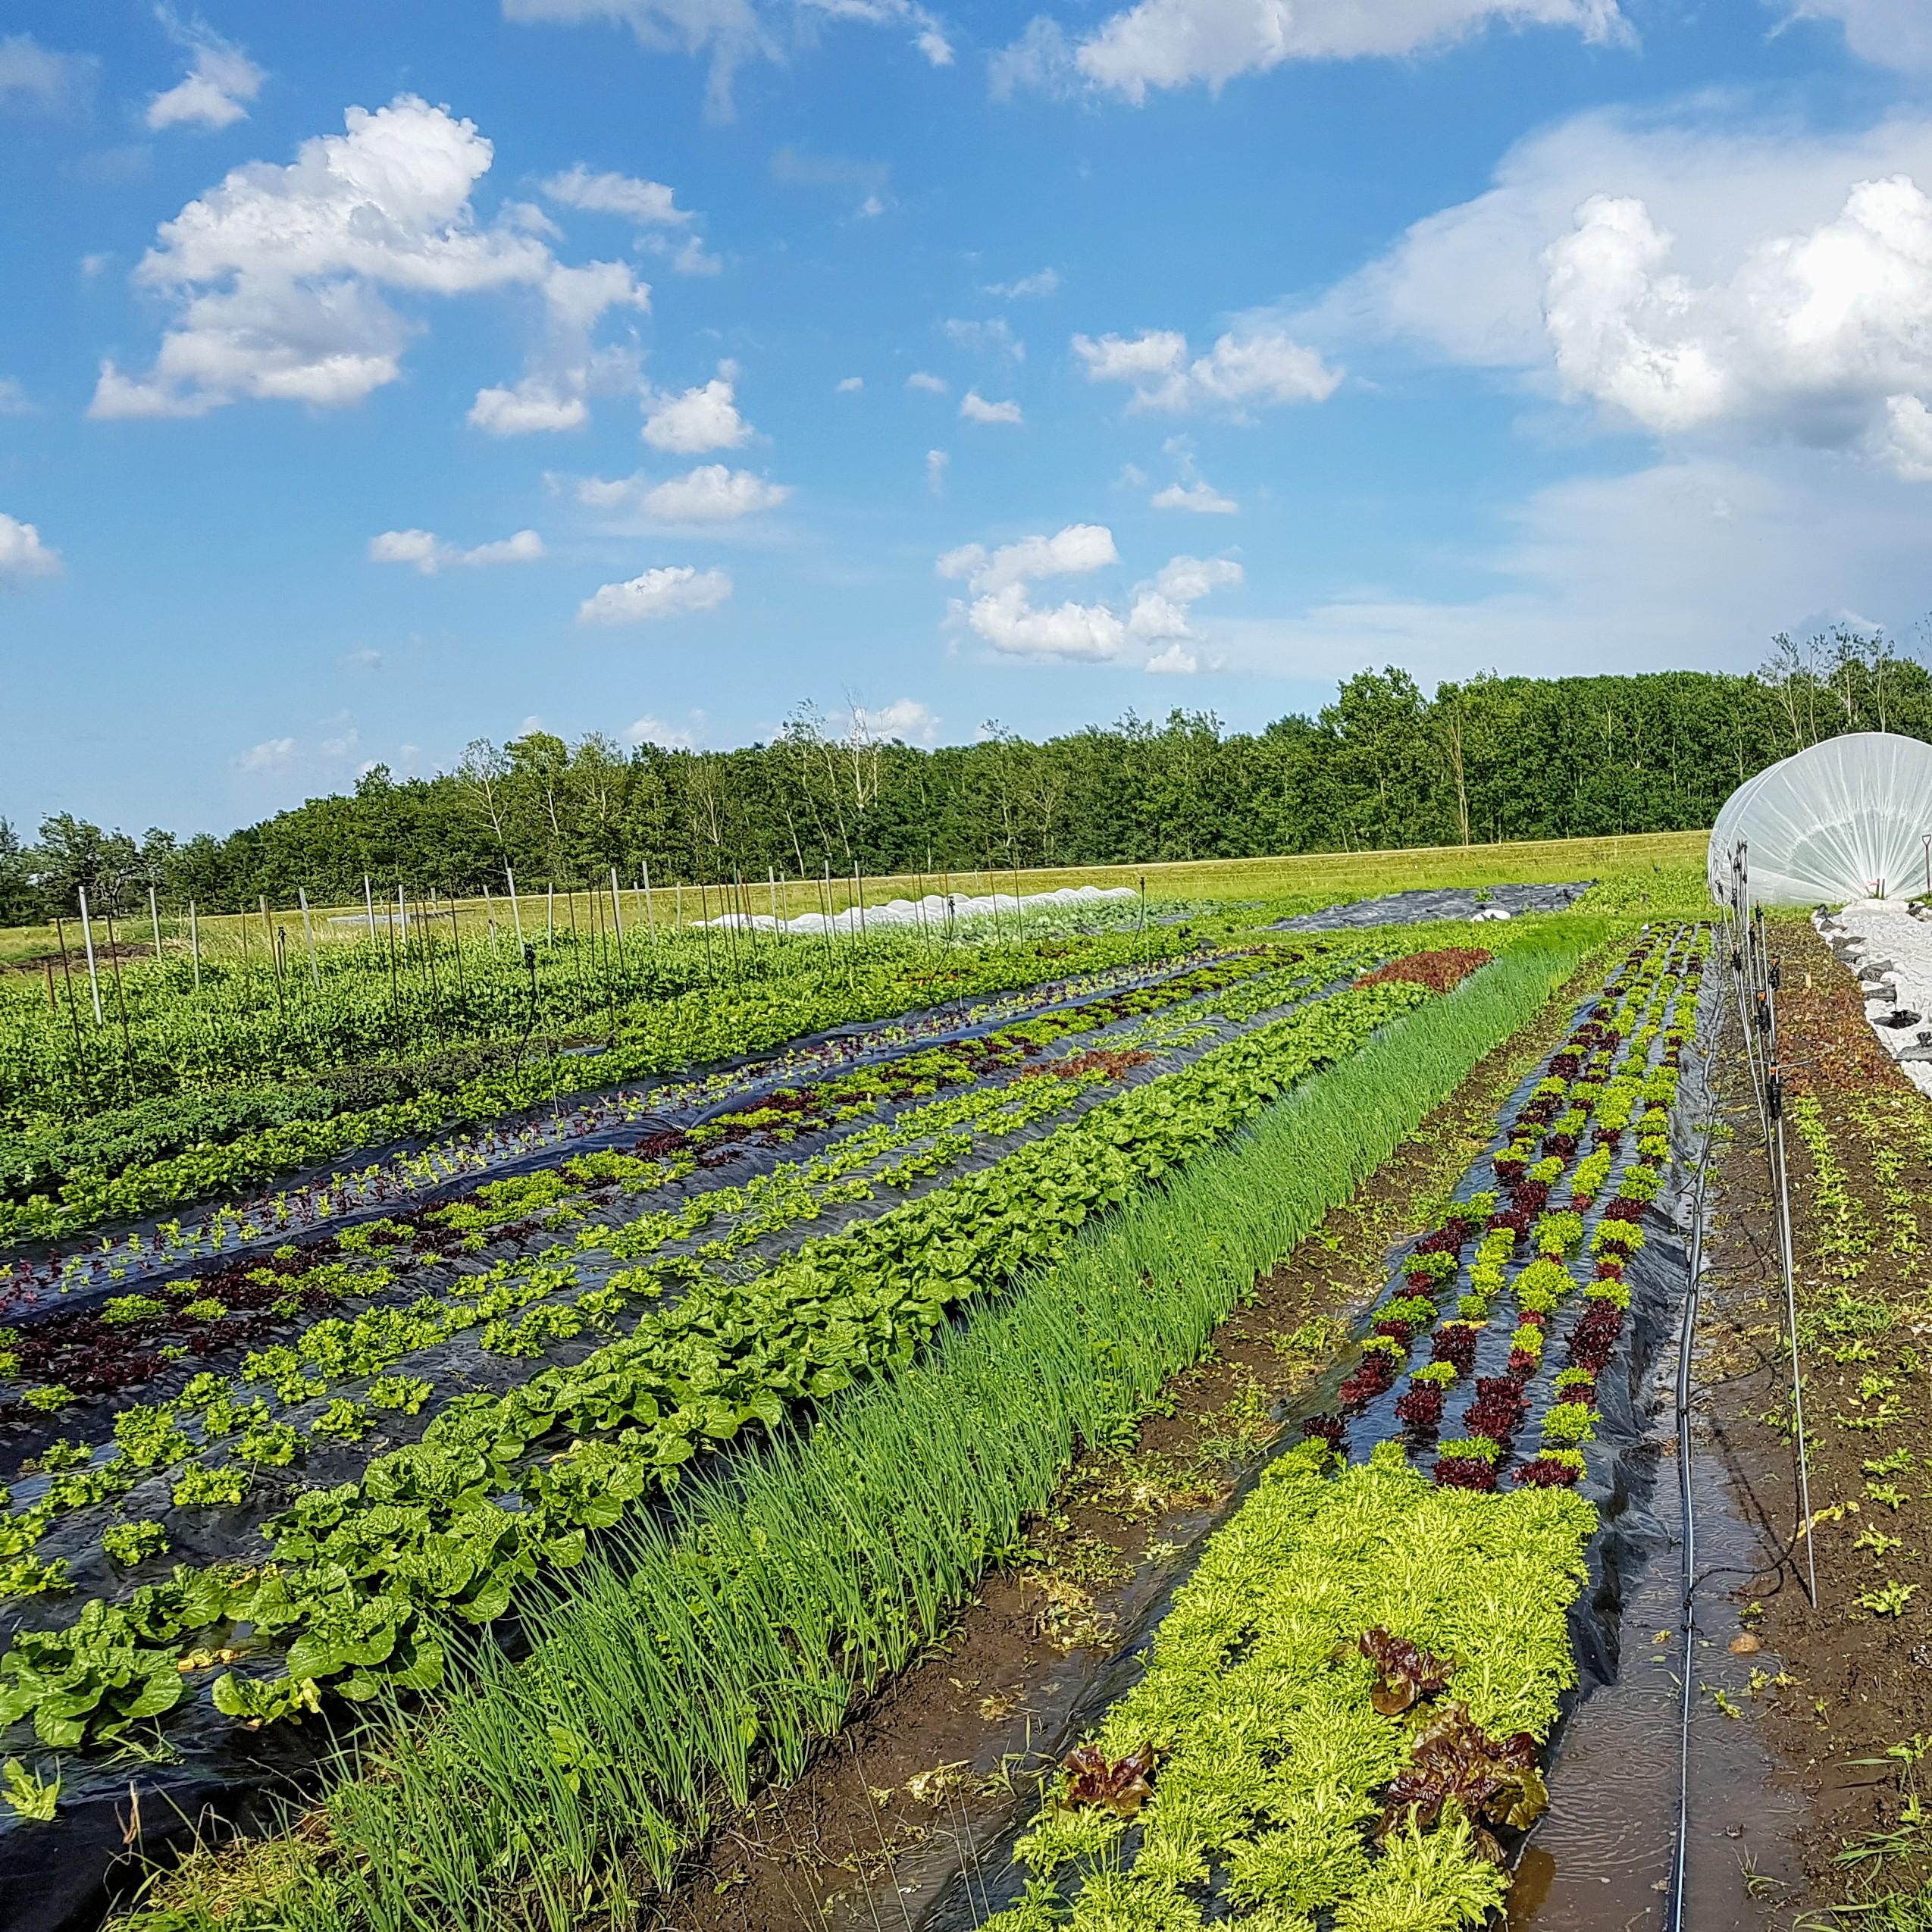 Farm Happenings for July 15, 2020